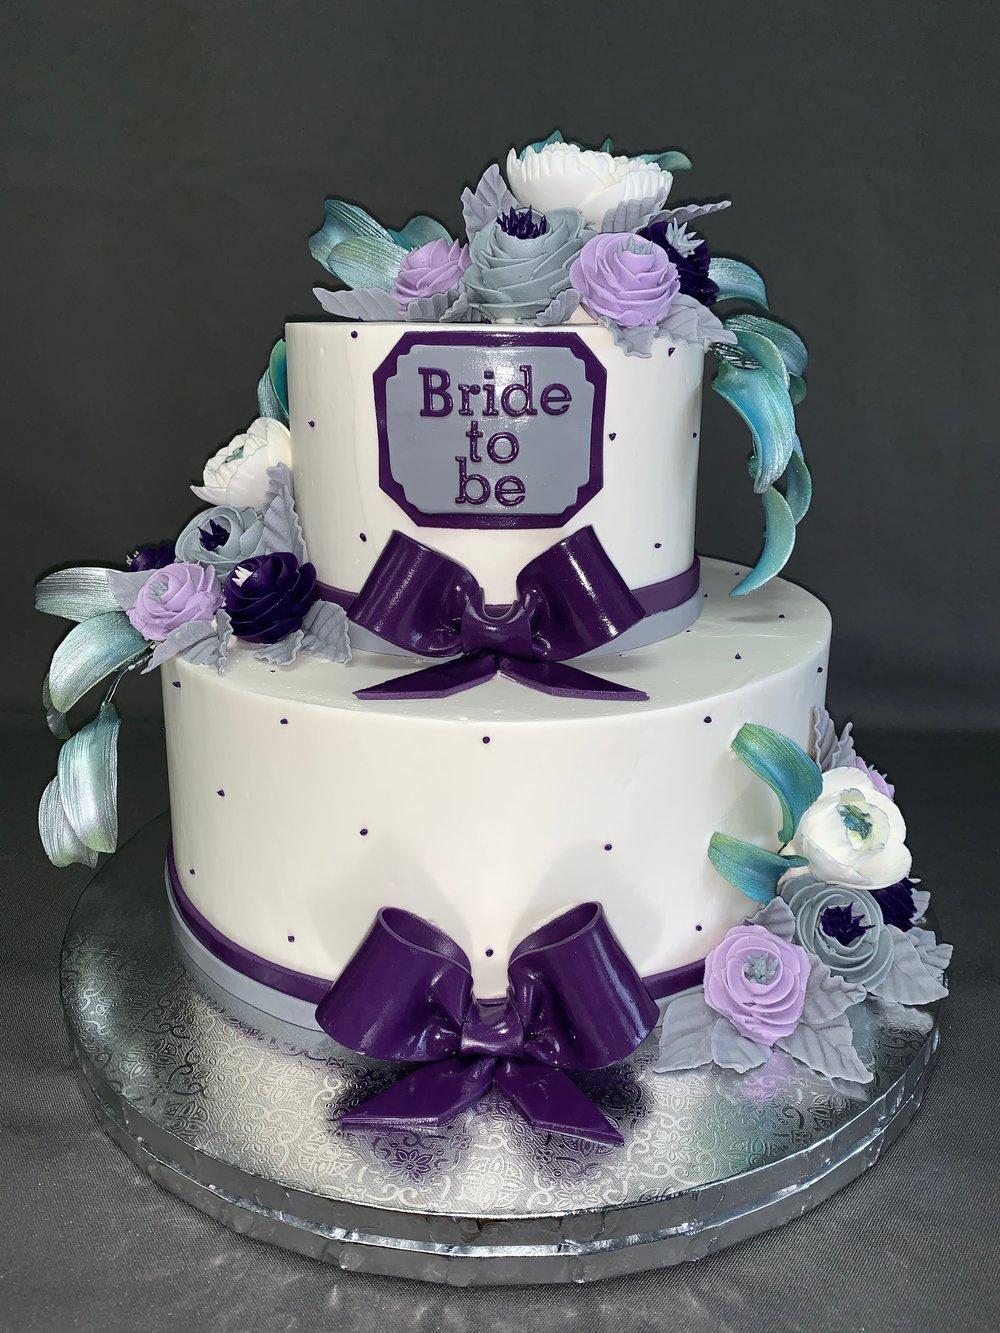 Best Bridal Shower Cake NJ